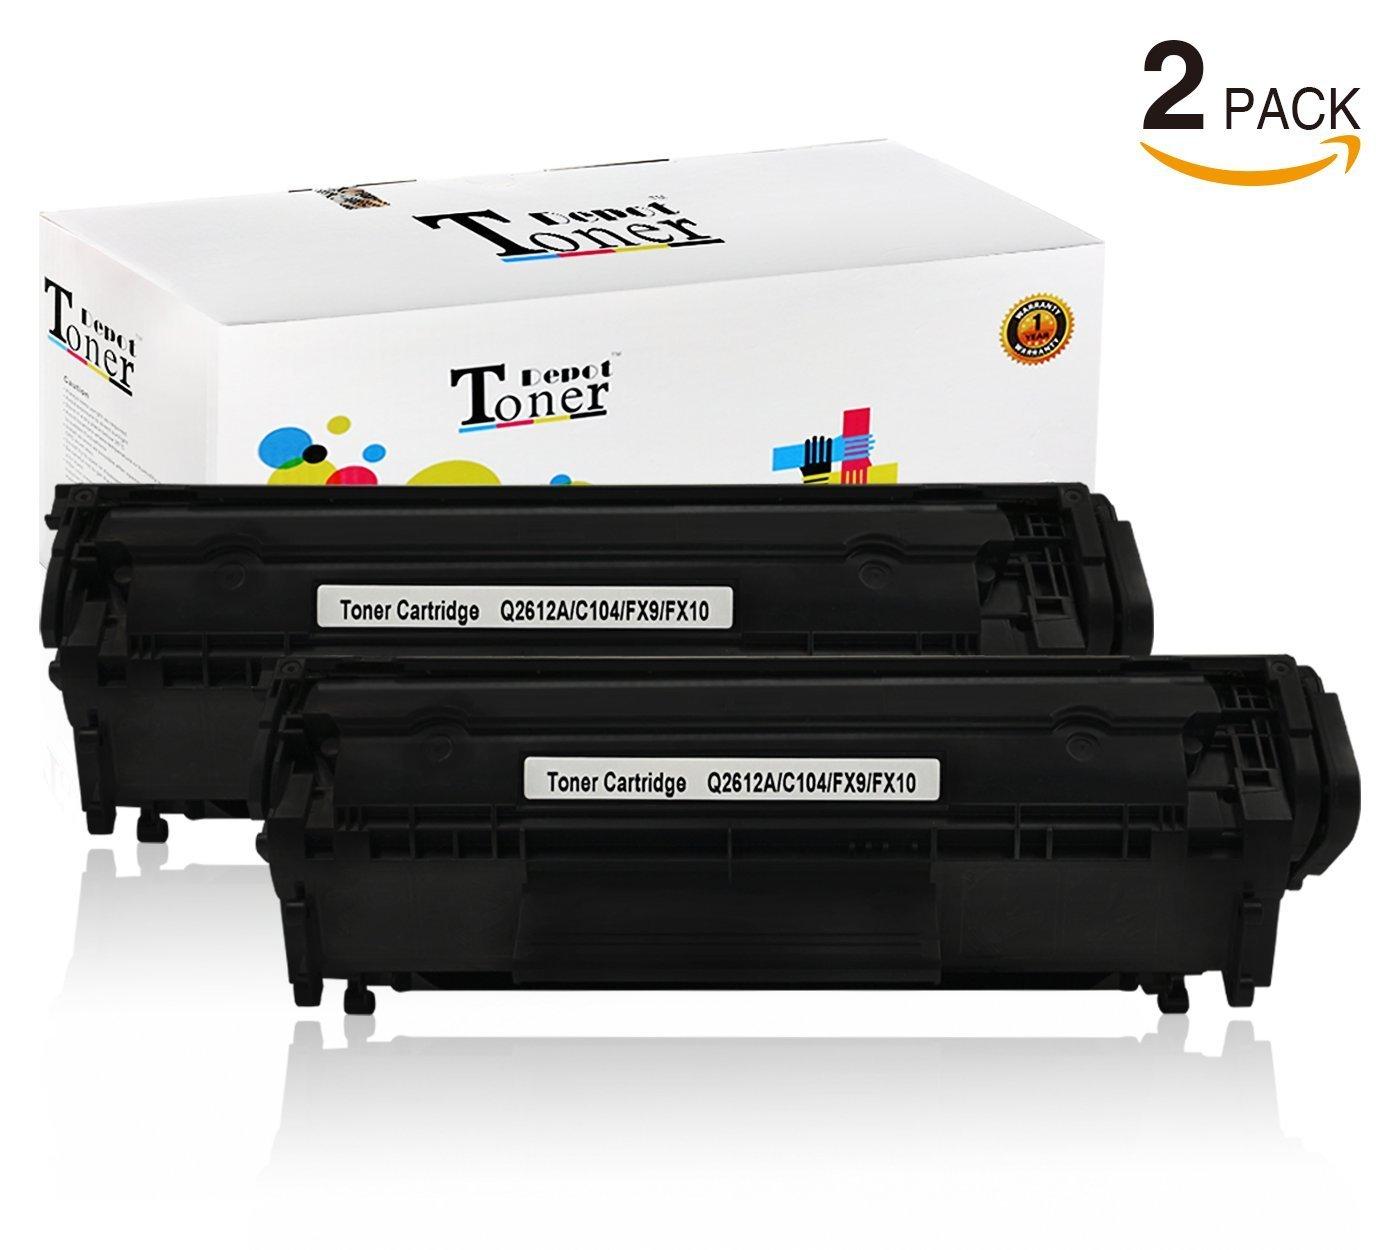 Get Quotations · 2 PACK TonerDepot Compatible with HP Q2612A, C104, FX9,  FX10 Toner Cartridge Multi